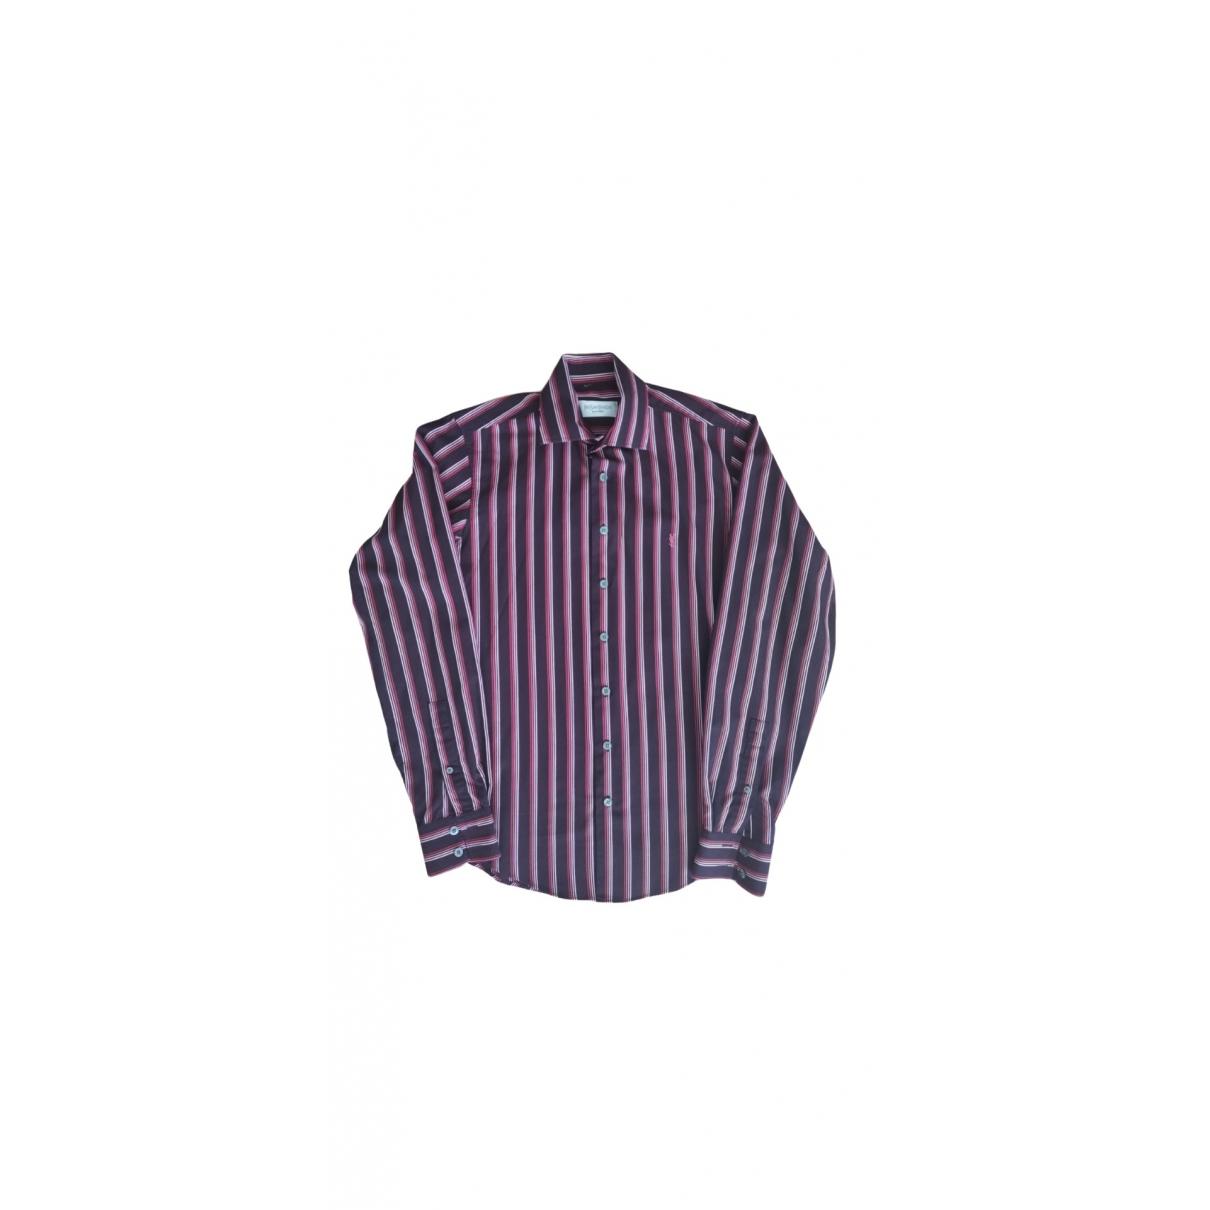 Yves Saint Laurent \N Burgundy Cotton Shirts for Men S International